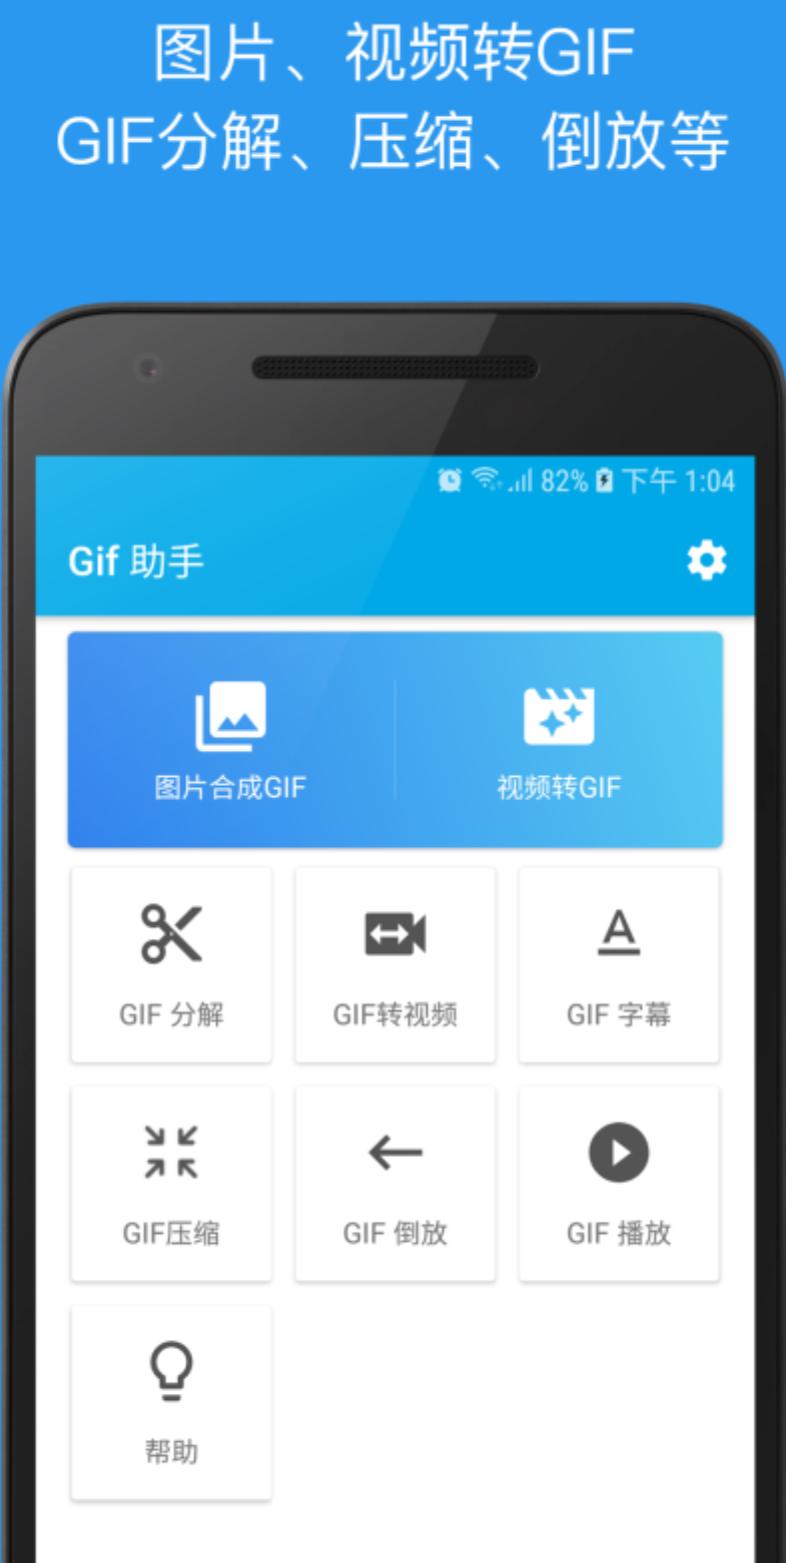 GIF助手v2.3.3去推荐_精简_完美_破解版